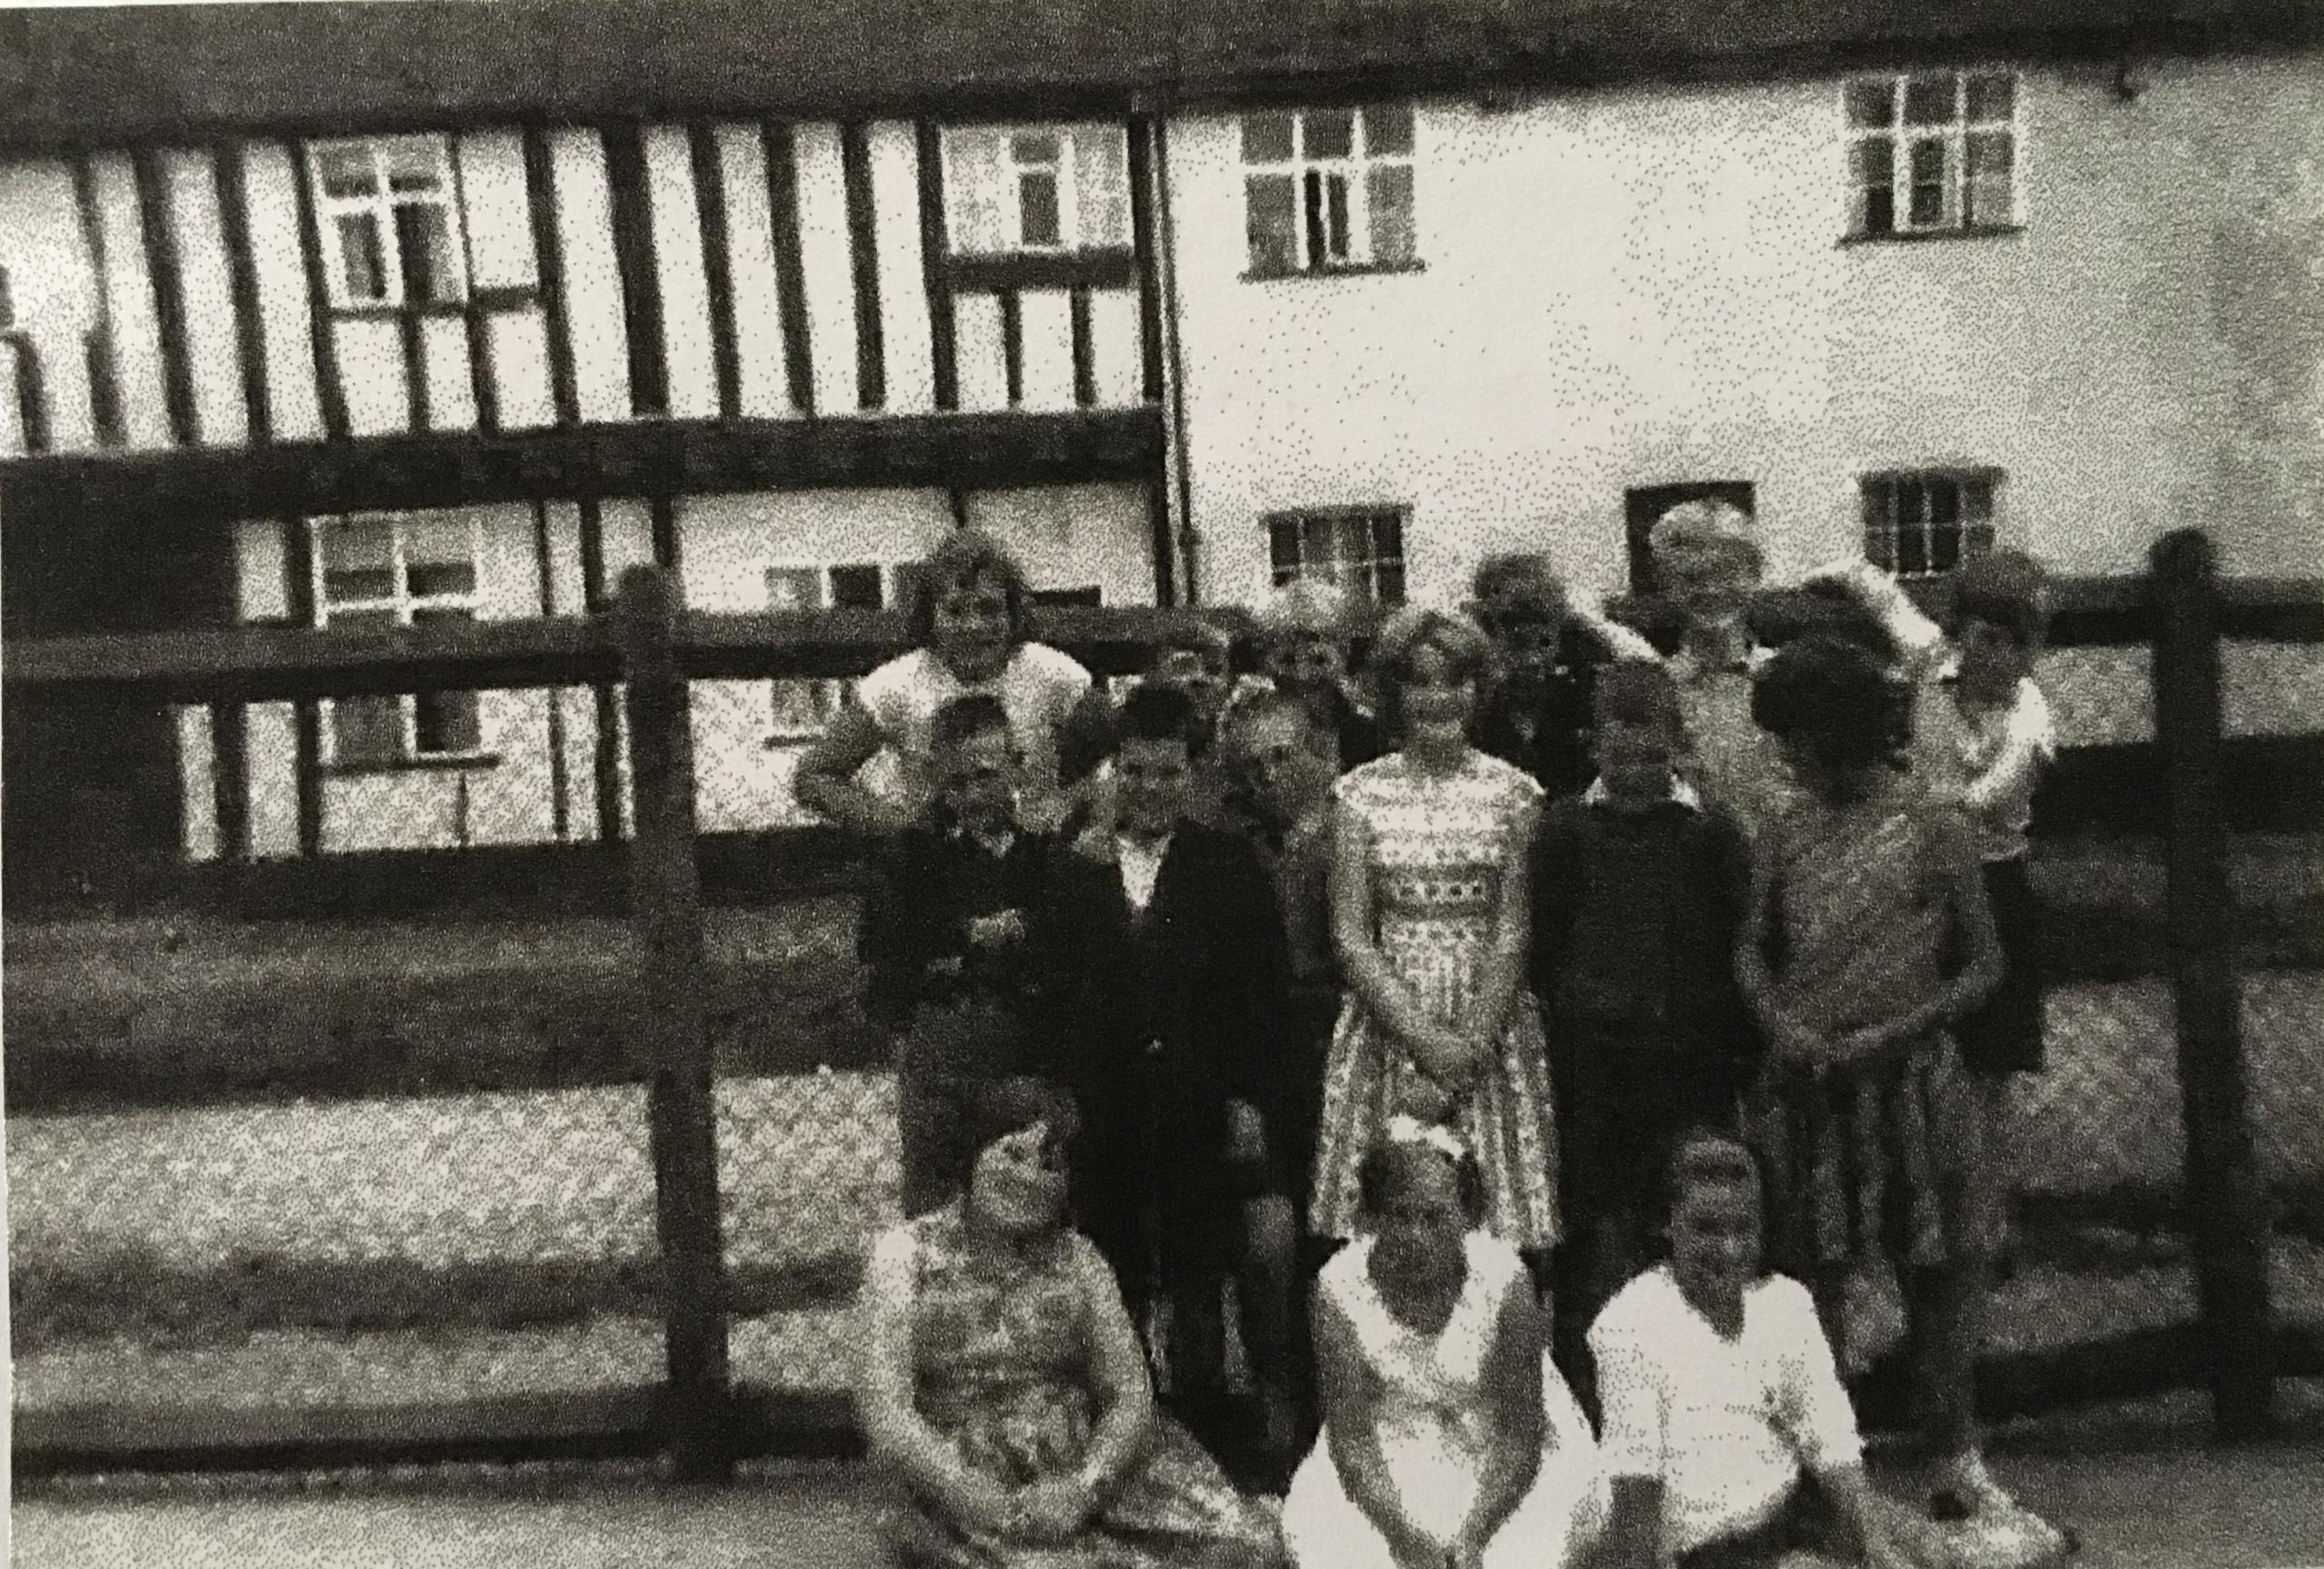 Some school leavers in July 1963